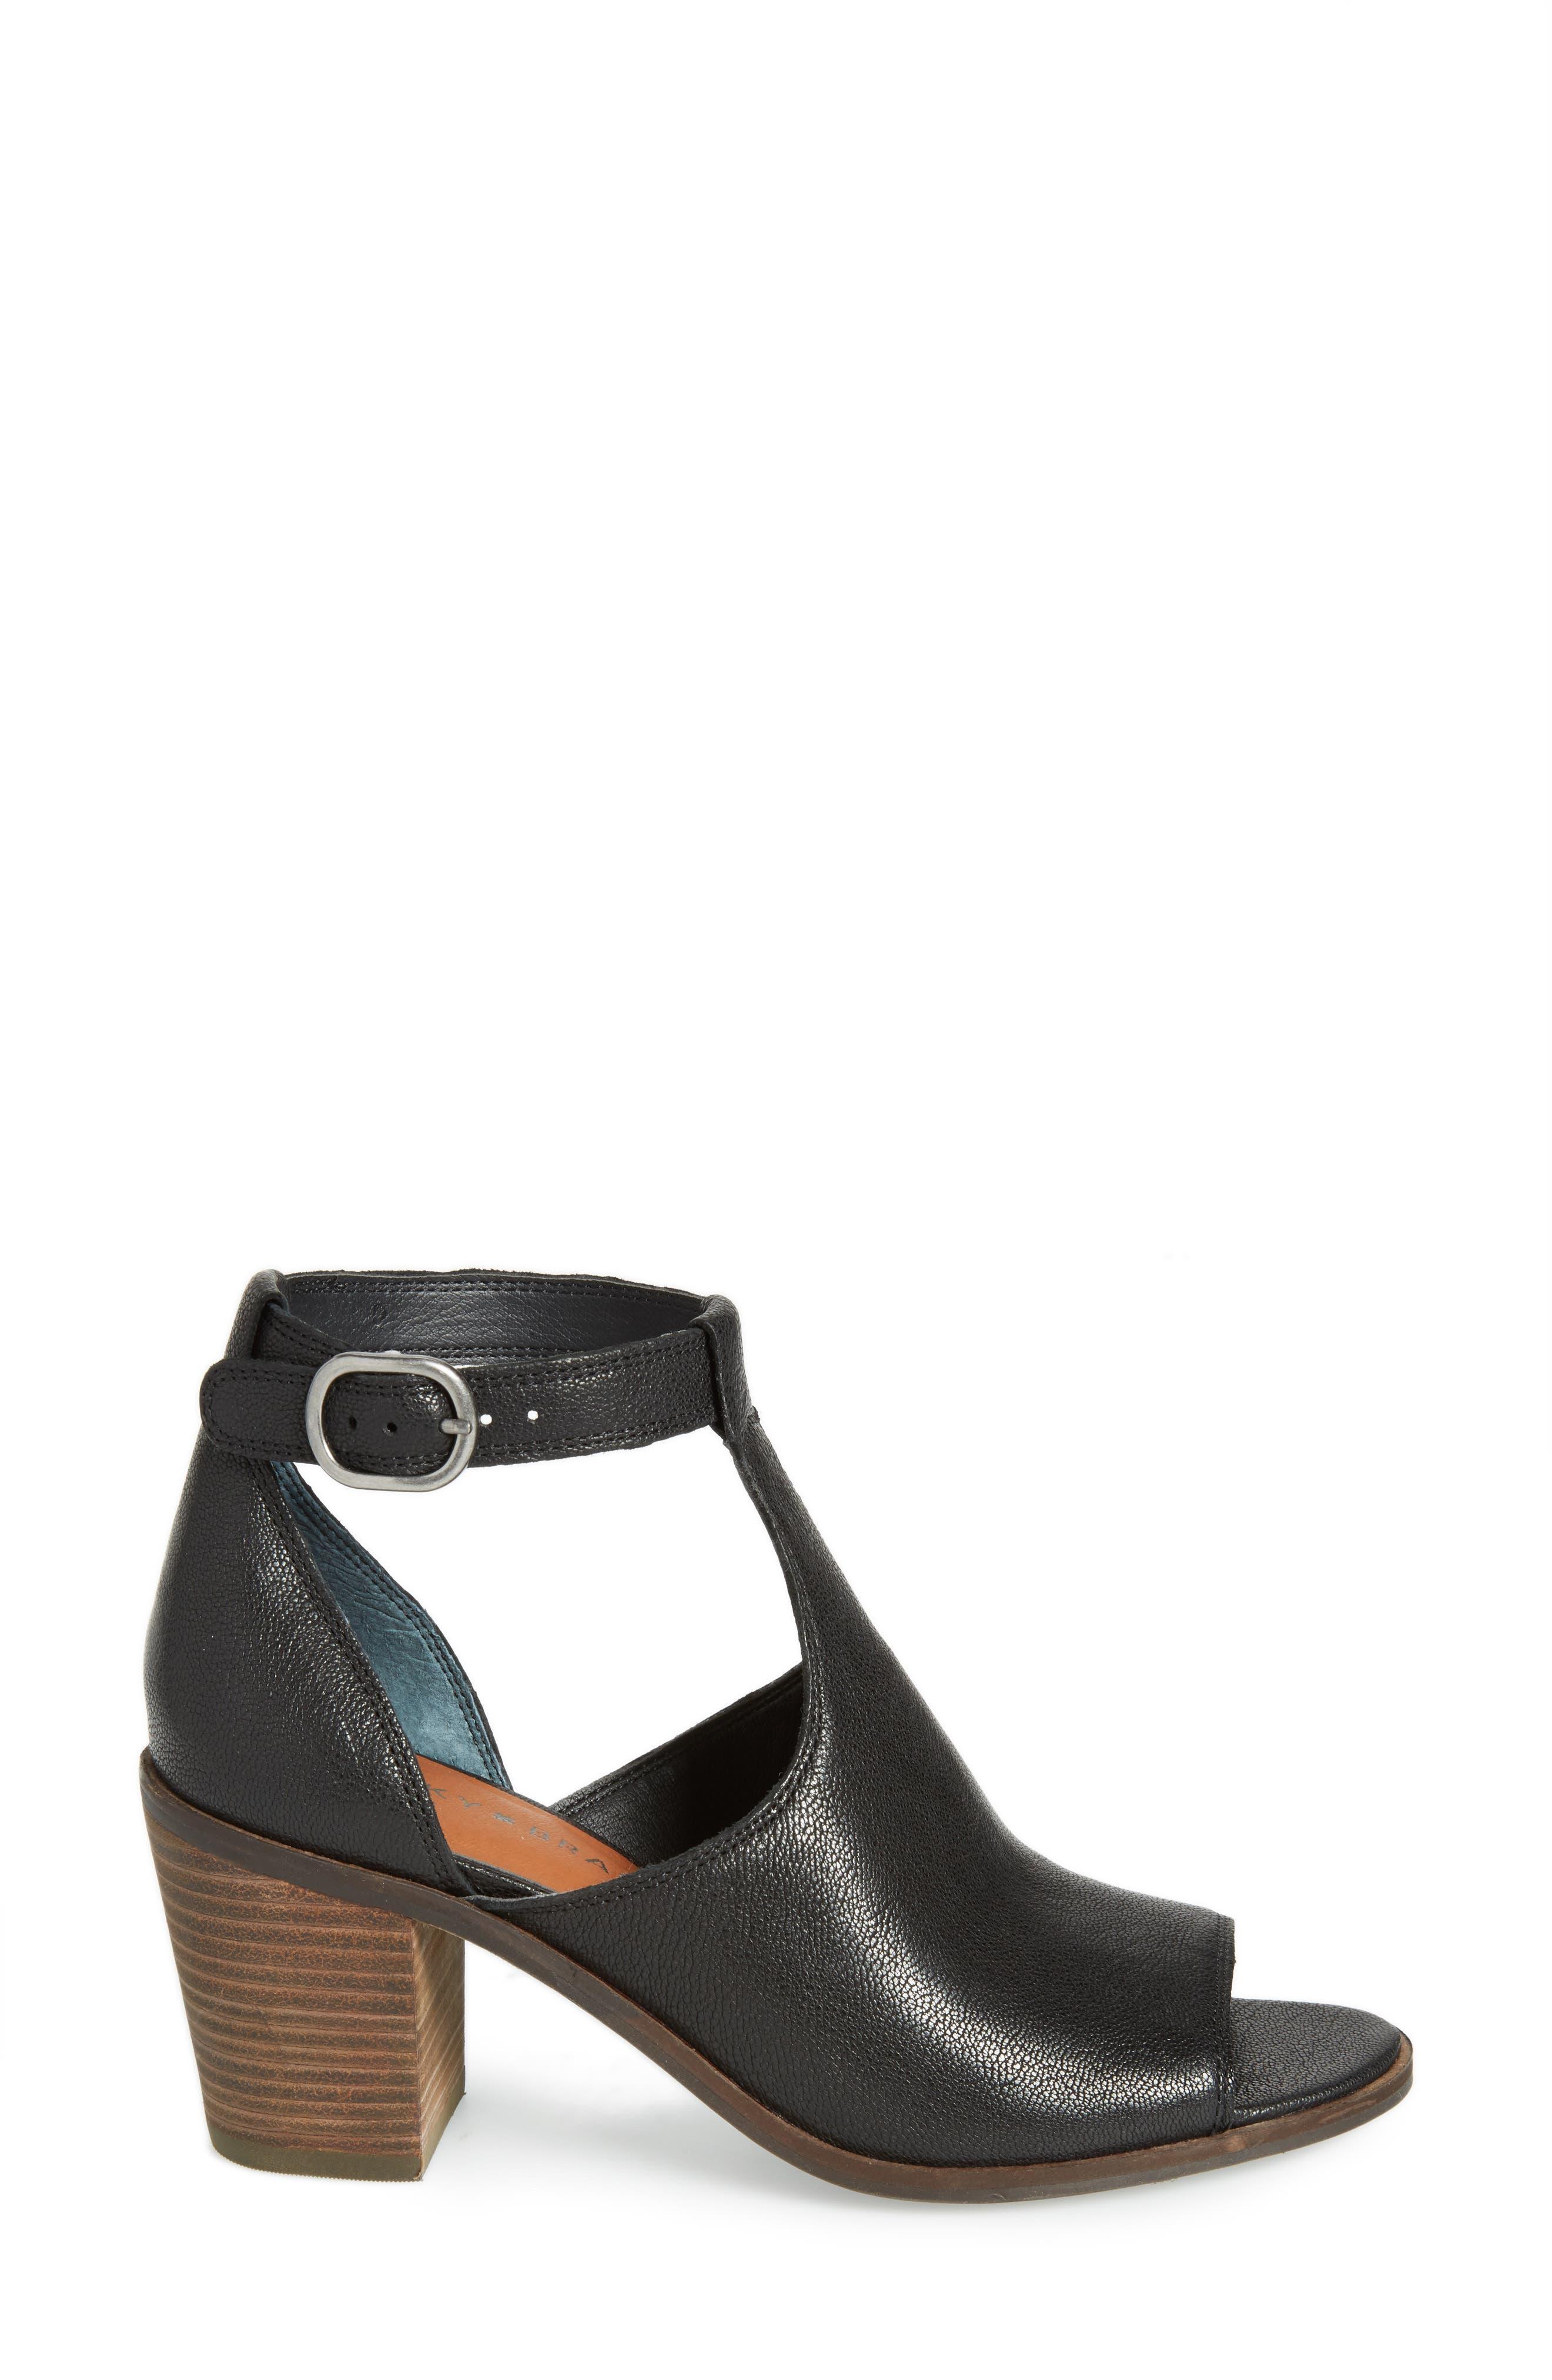 Kadian Block Heel Sandal,                             Alternate thumbnail 3, color,                             Black Leather